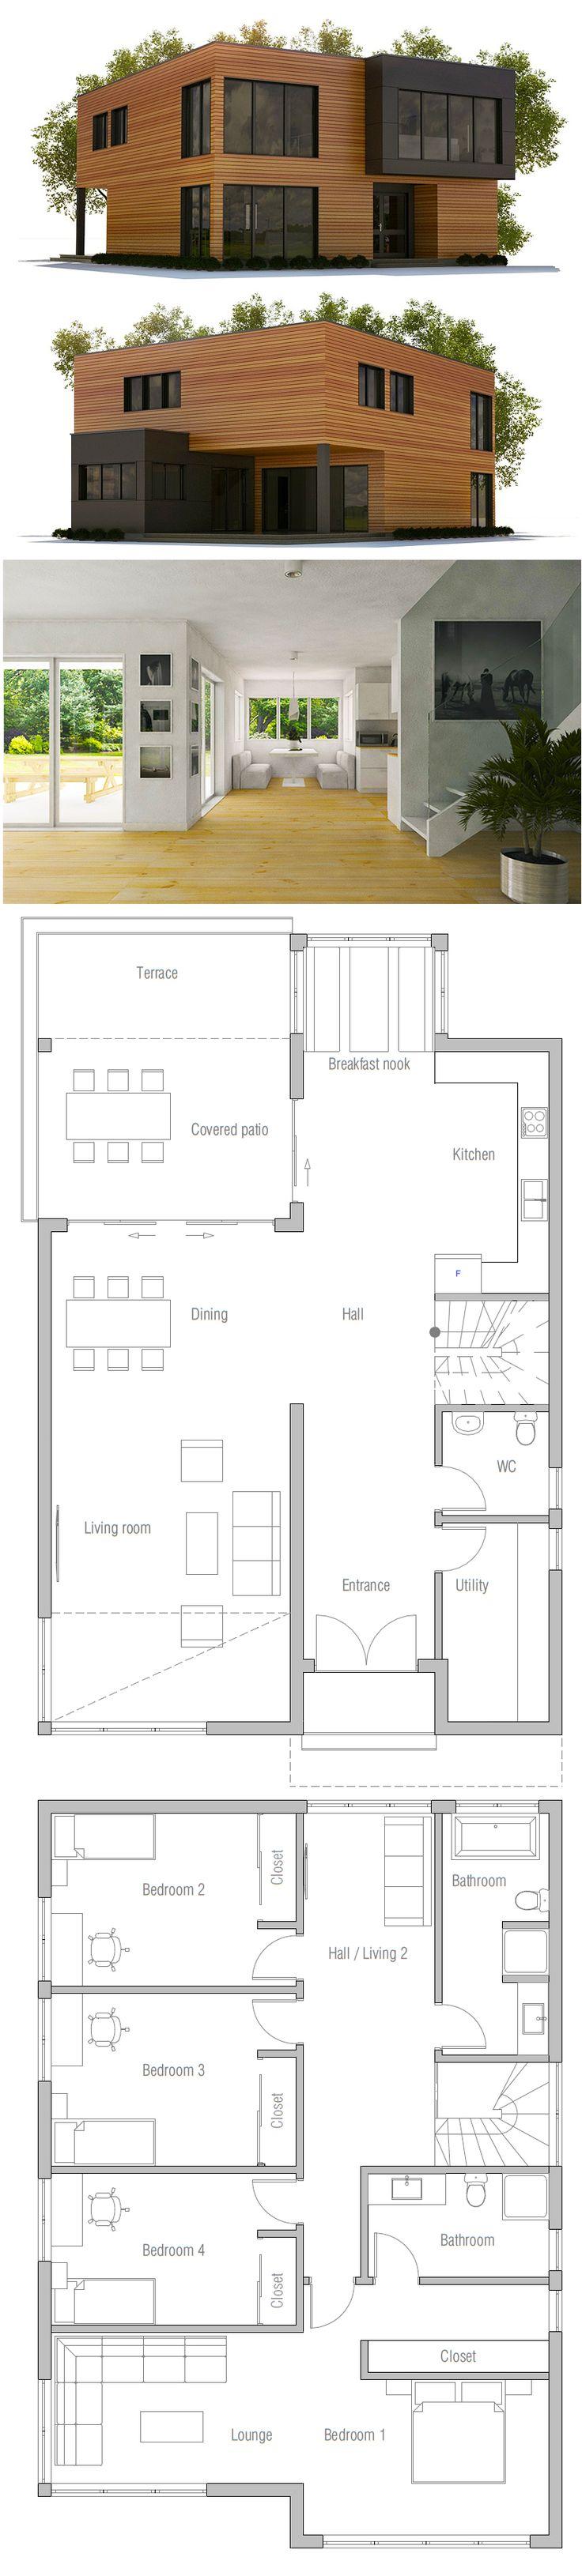 house design house plan ch395 100 1735 best Architecture